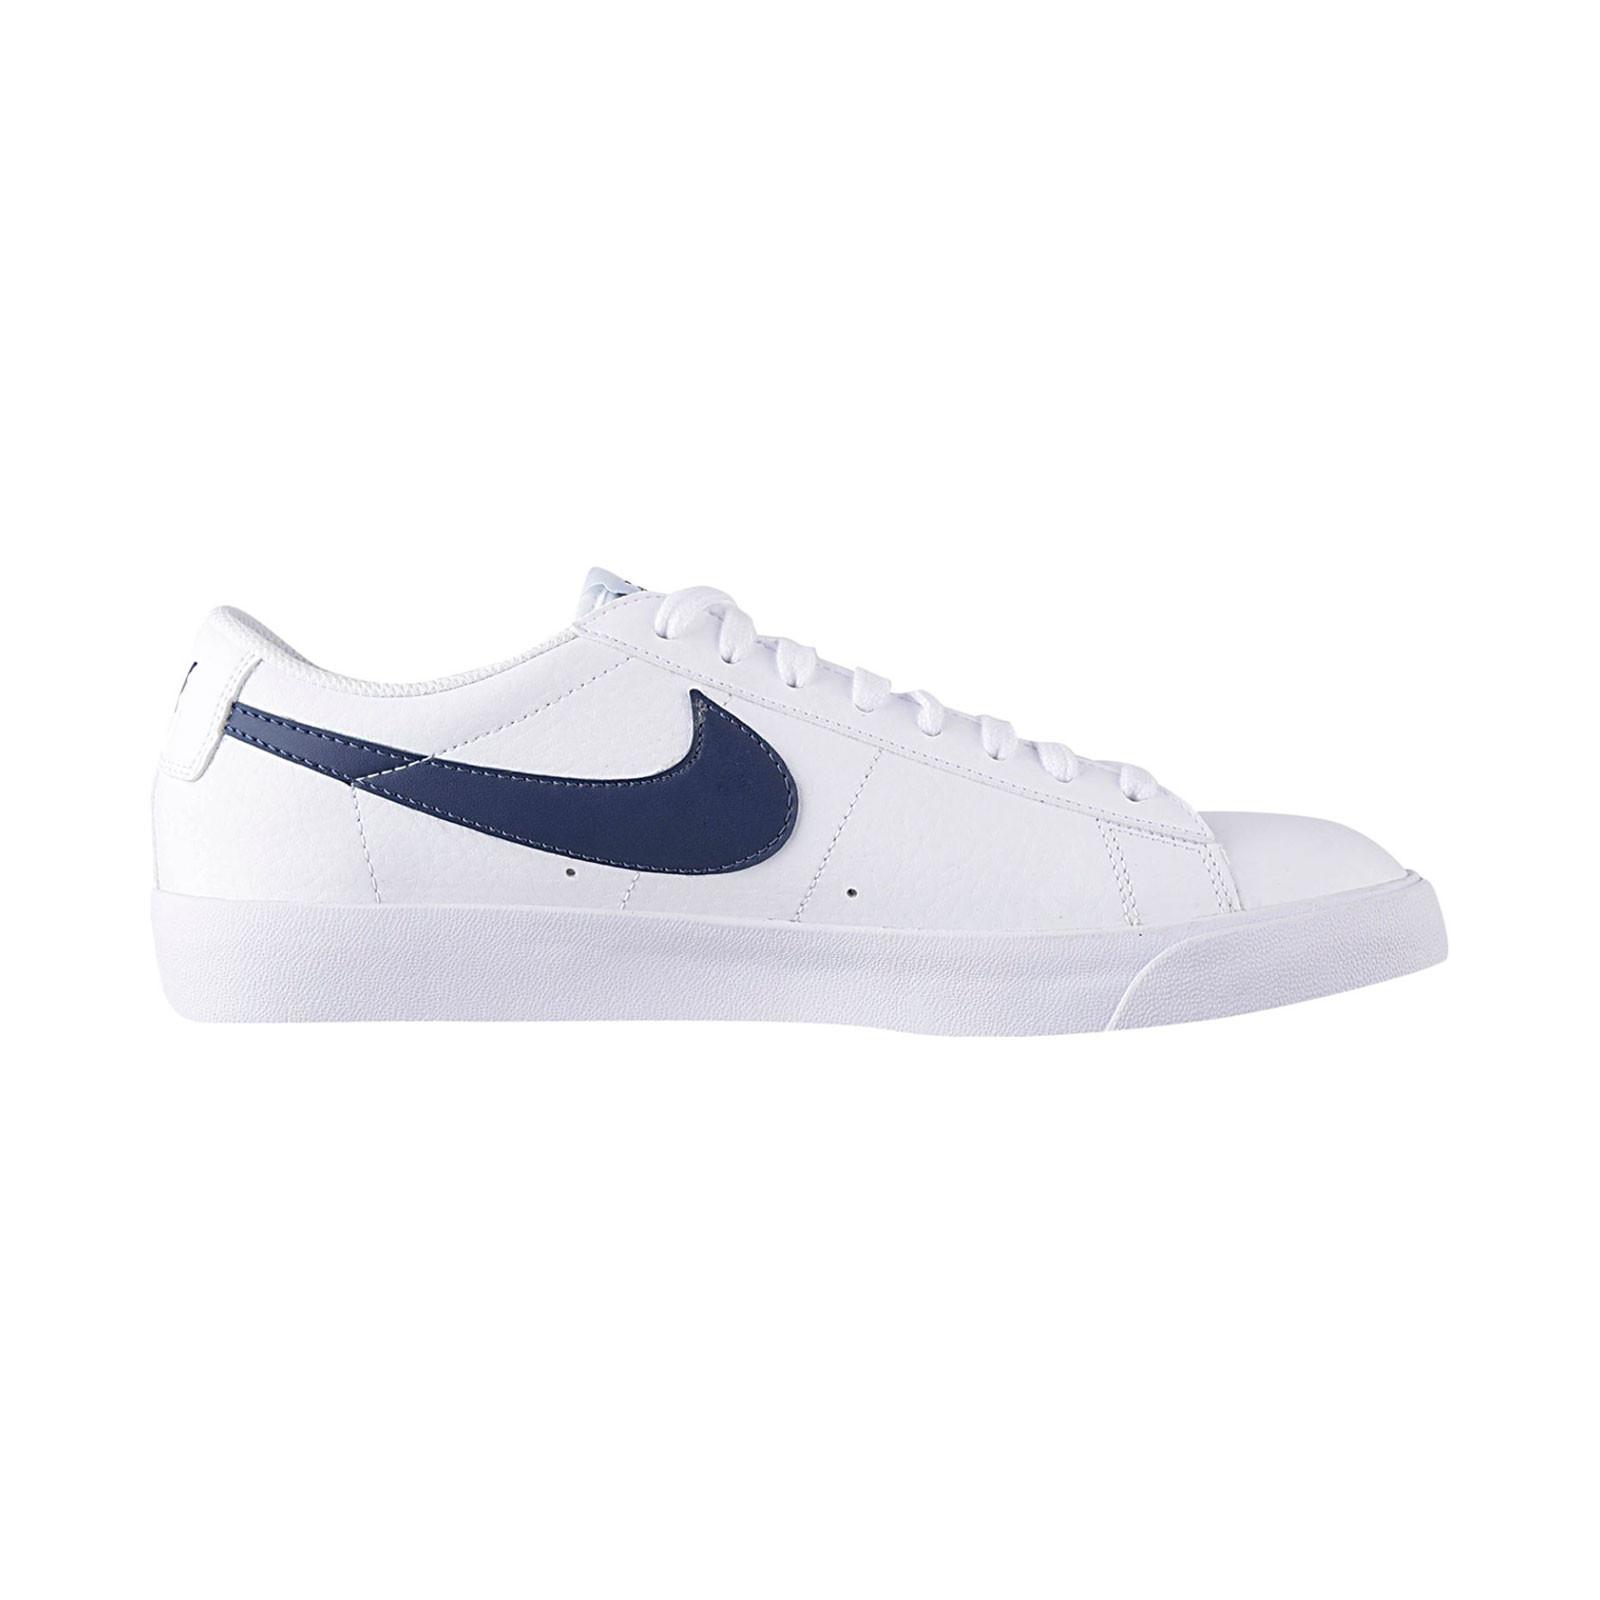 Zapatillas Nike Blazer Low Leather Sportswear para Hombre